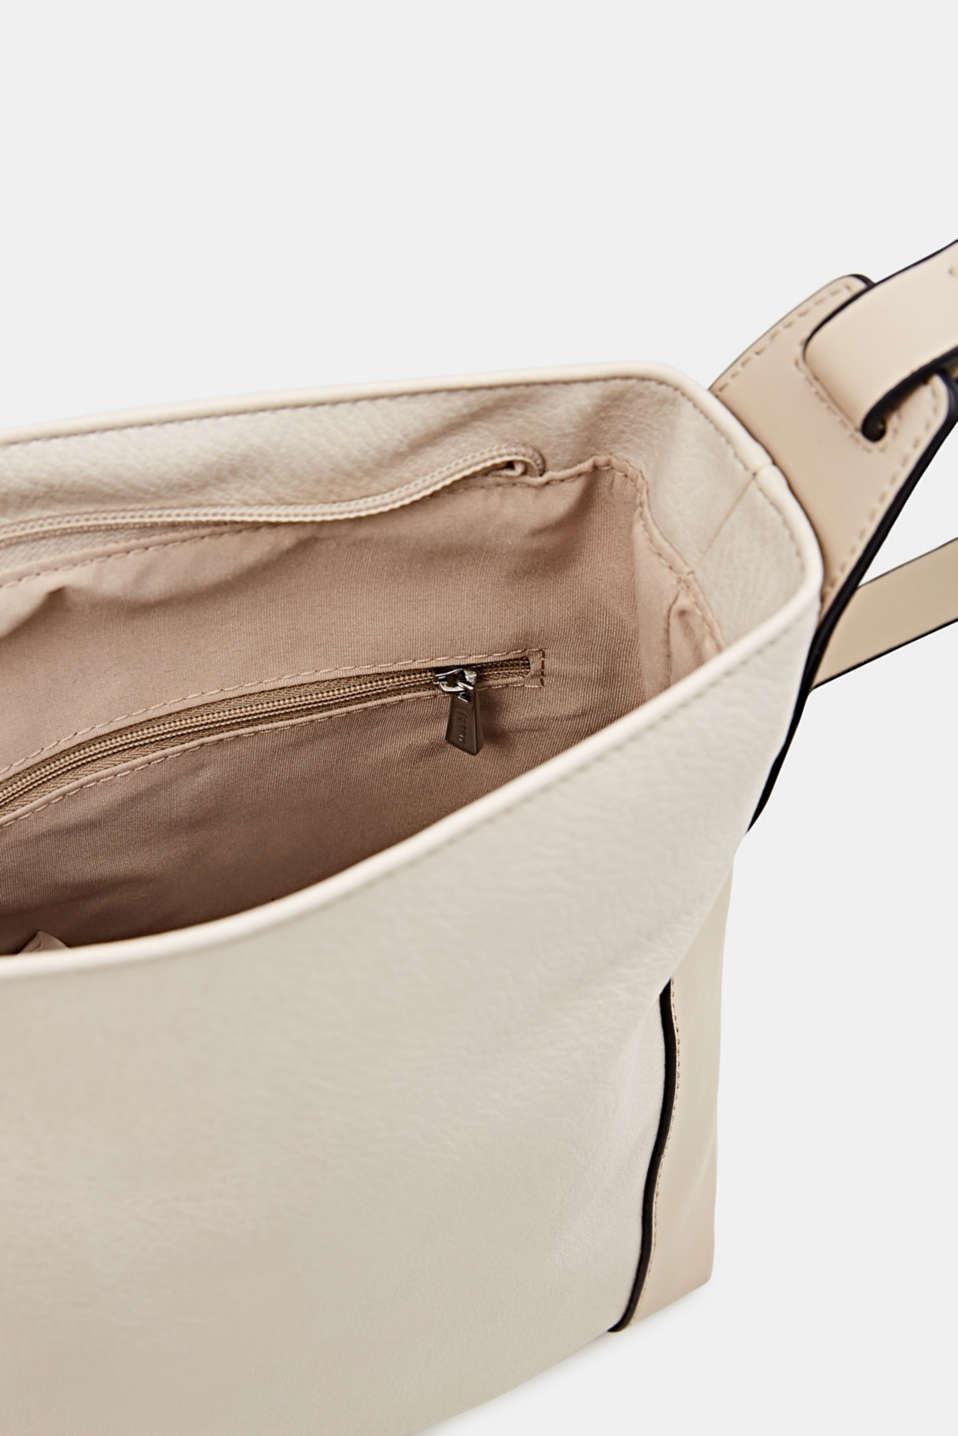 Mixed material shoulder bag, vegan, CREAM BEIGE, detail image number 4